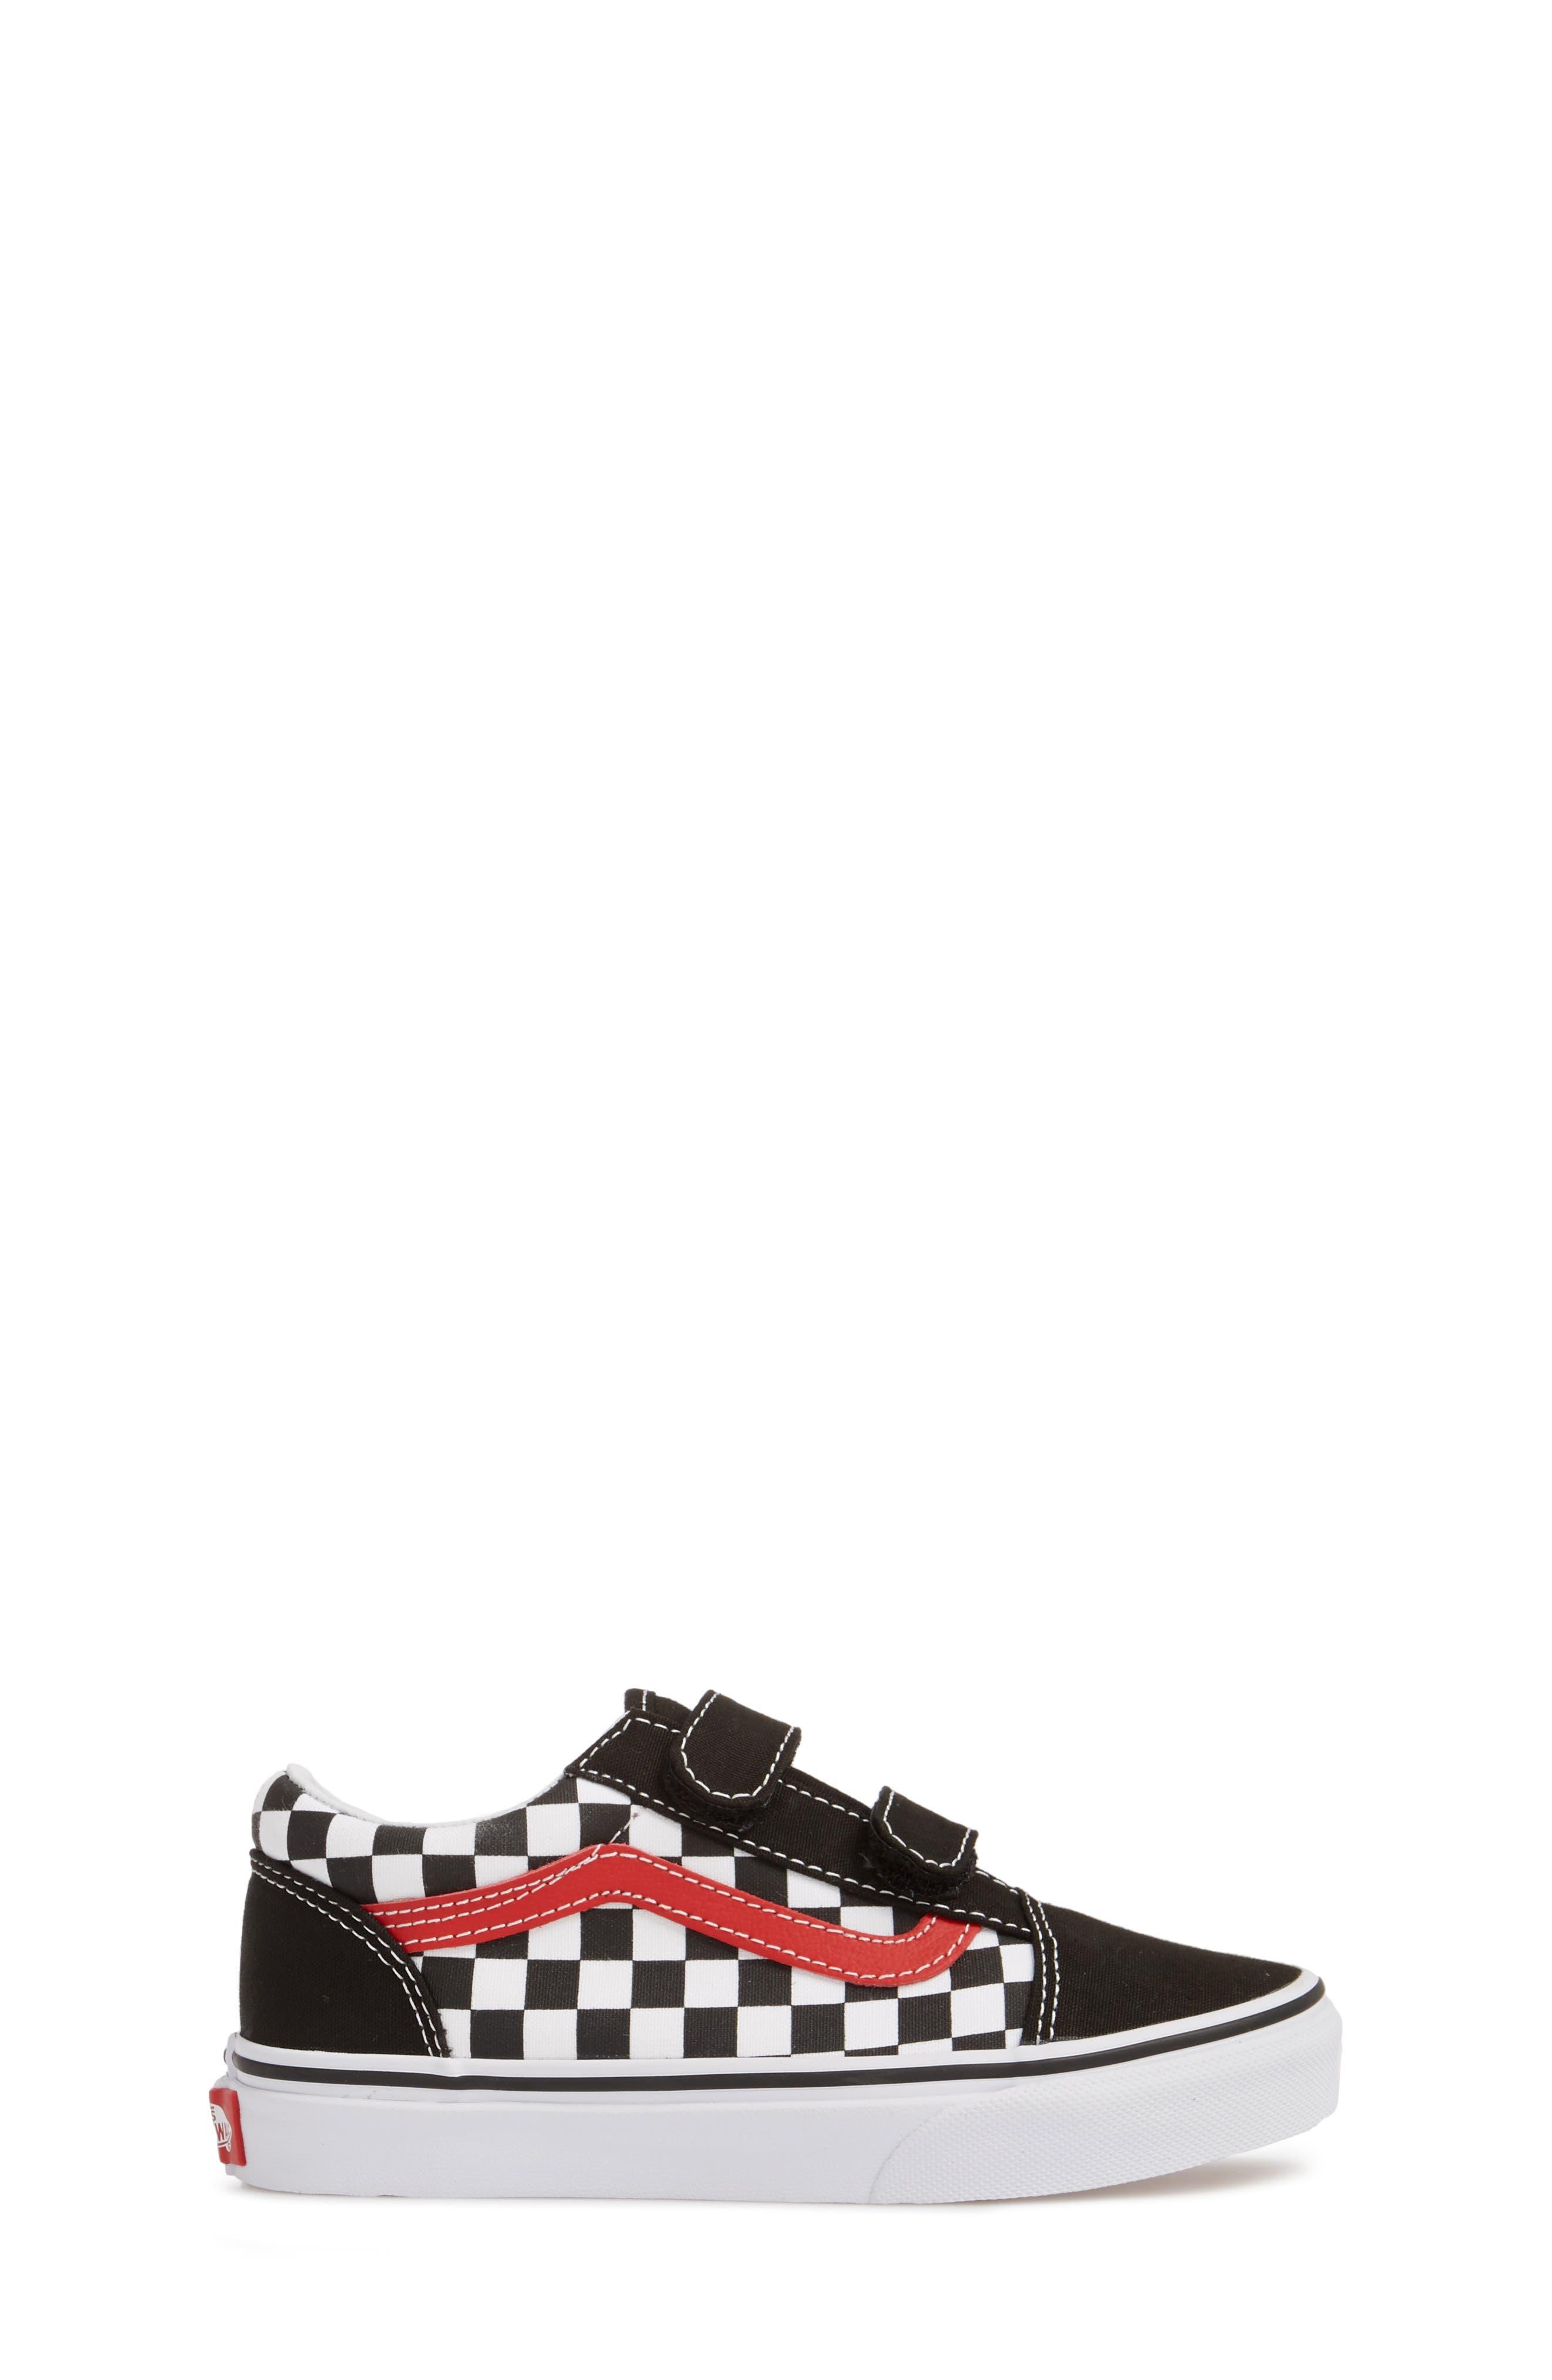 Old Skool V Sneaker,                             Alternate thumbnail 3, color,                             CHECKERBOARD BLACK/ RED/ WHITE